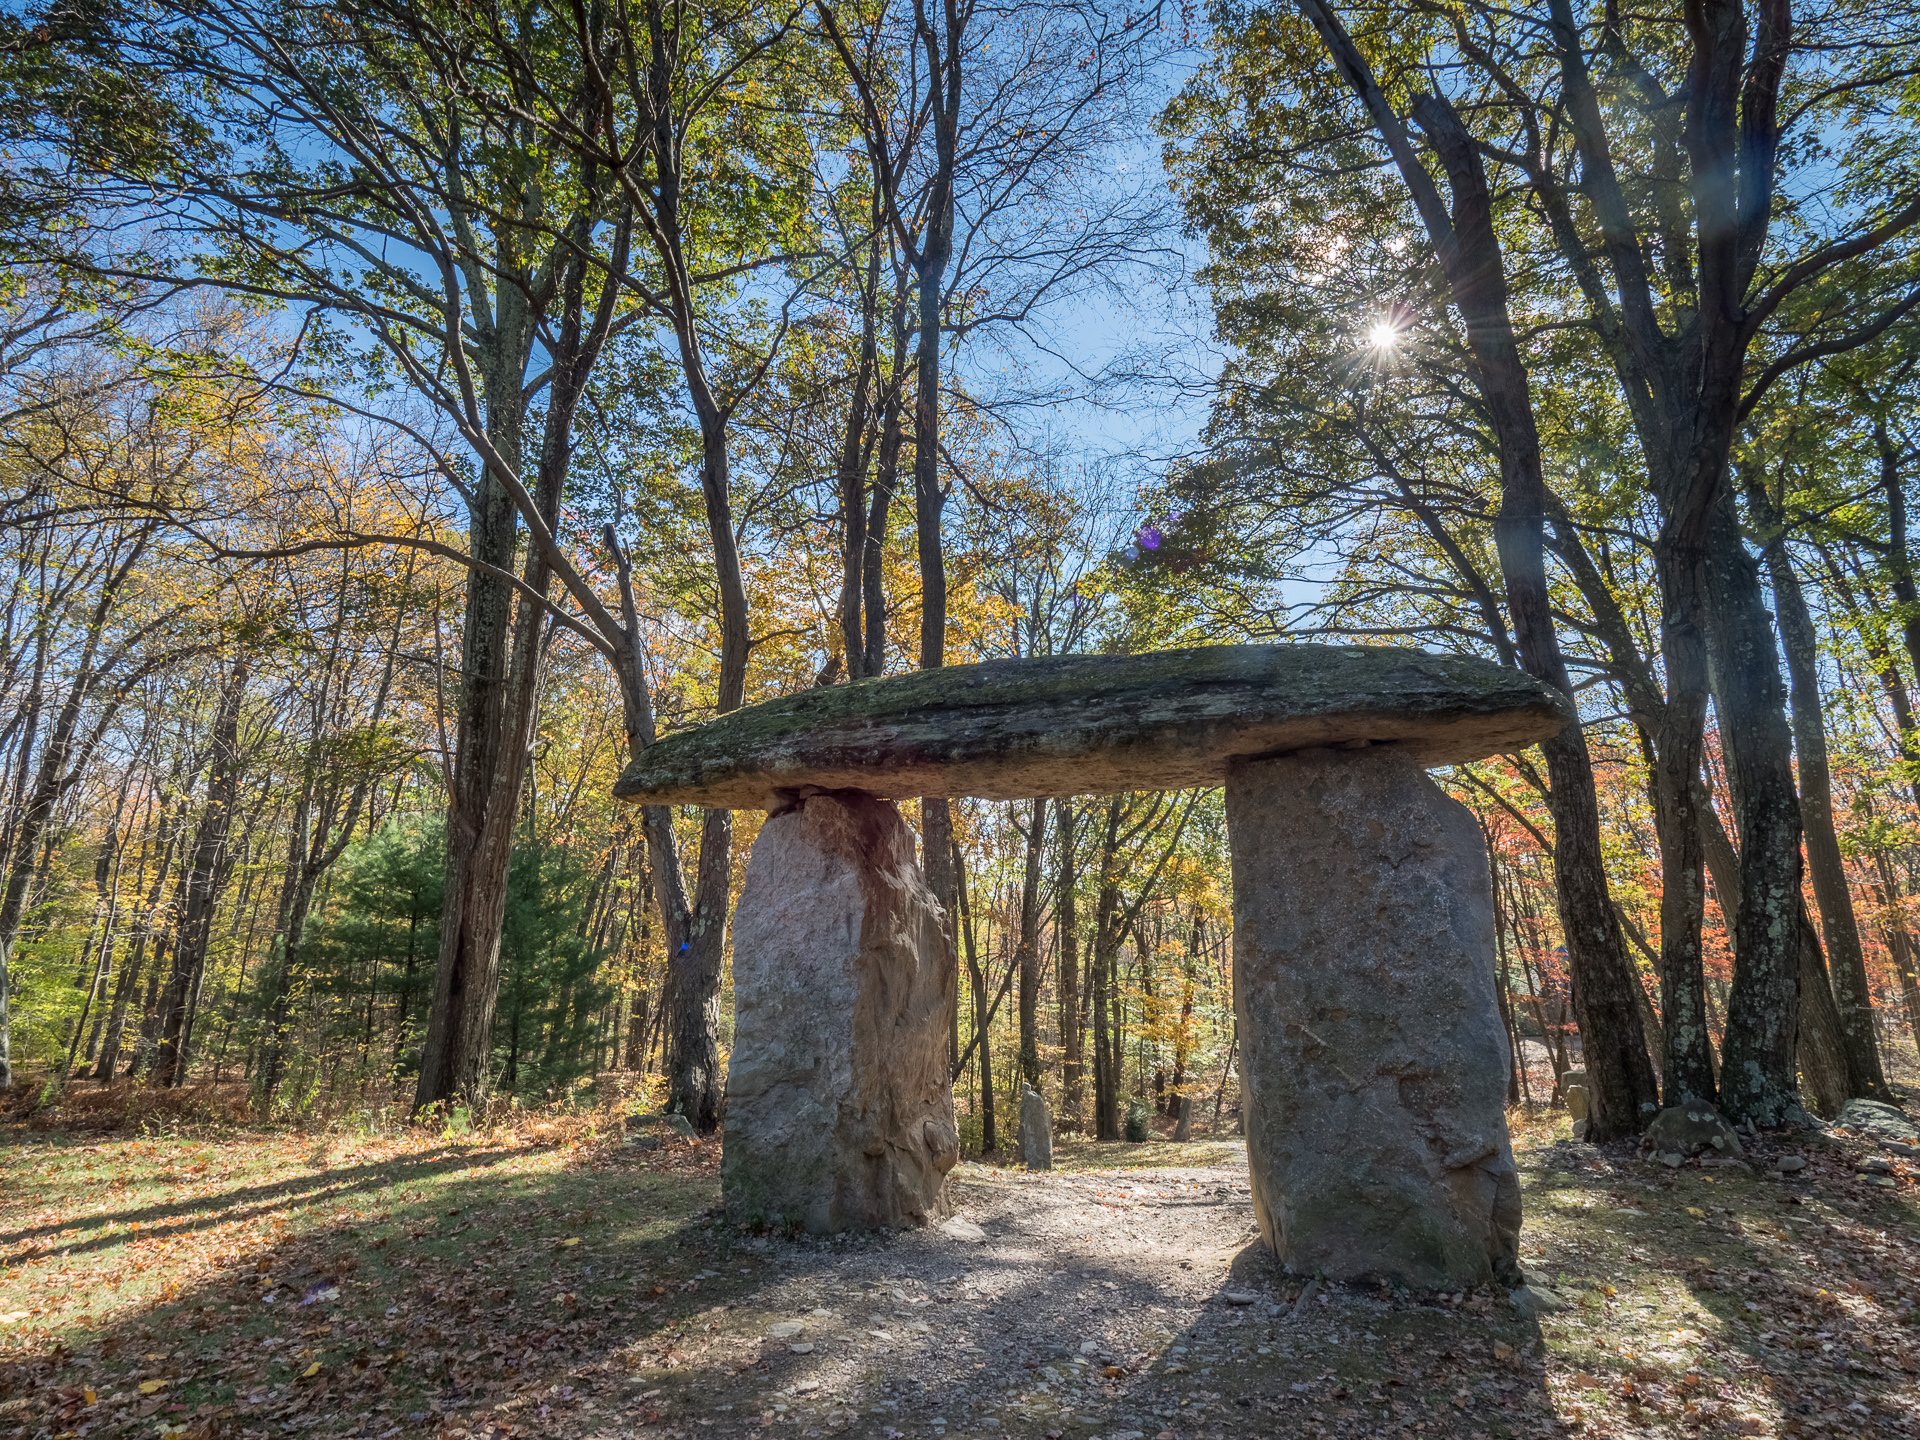 Thor's Gate, Columcille Megalith Park, Bangor, Pennsylvania, United States, © 2017 Bob Hahn